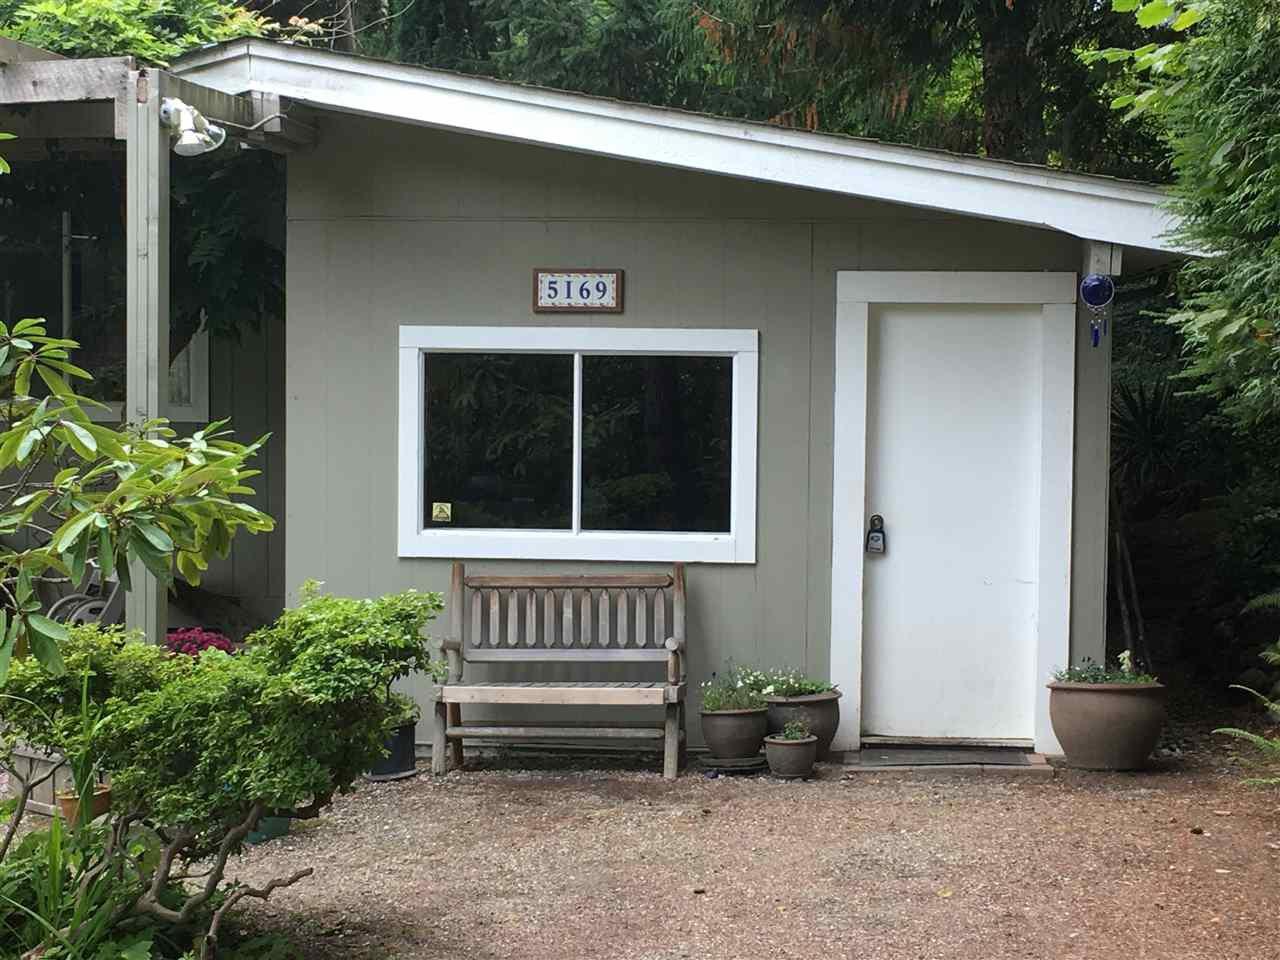 Main Photo: 5169 CHAPMAN Road in Sechelt: Sechelt District House for sale (Sunshine Coast)  : MLS®# R2409855